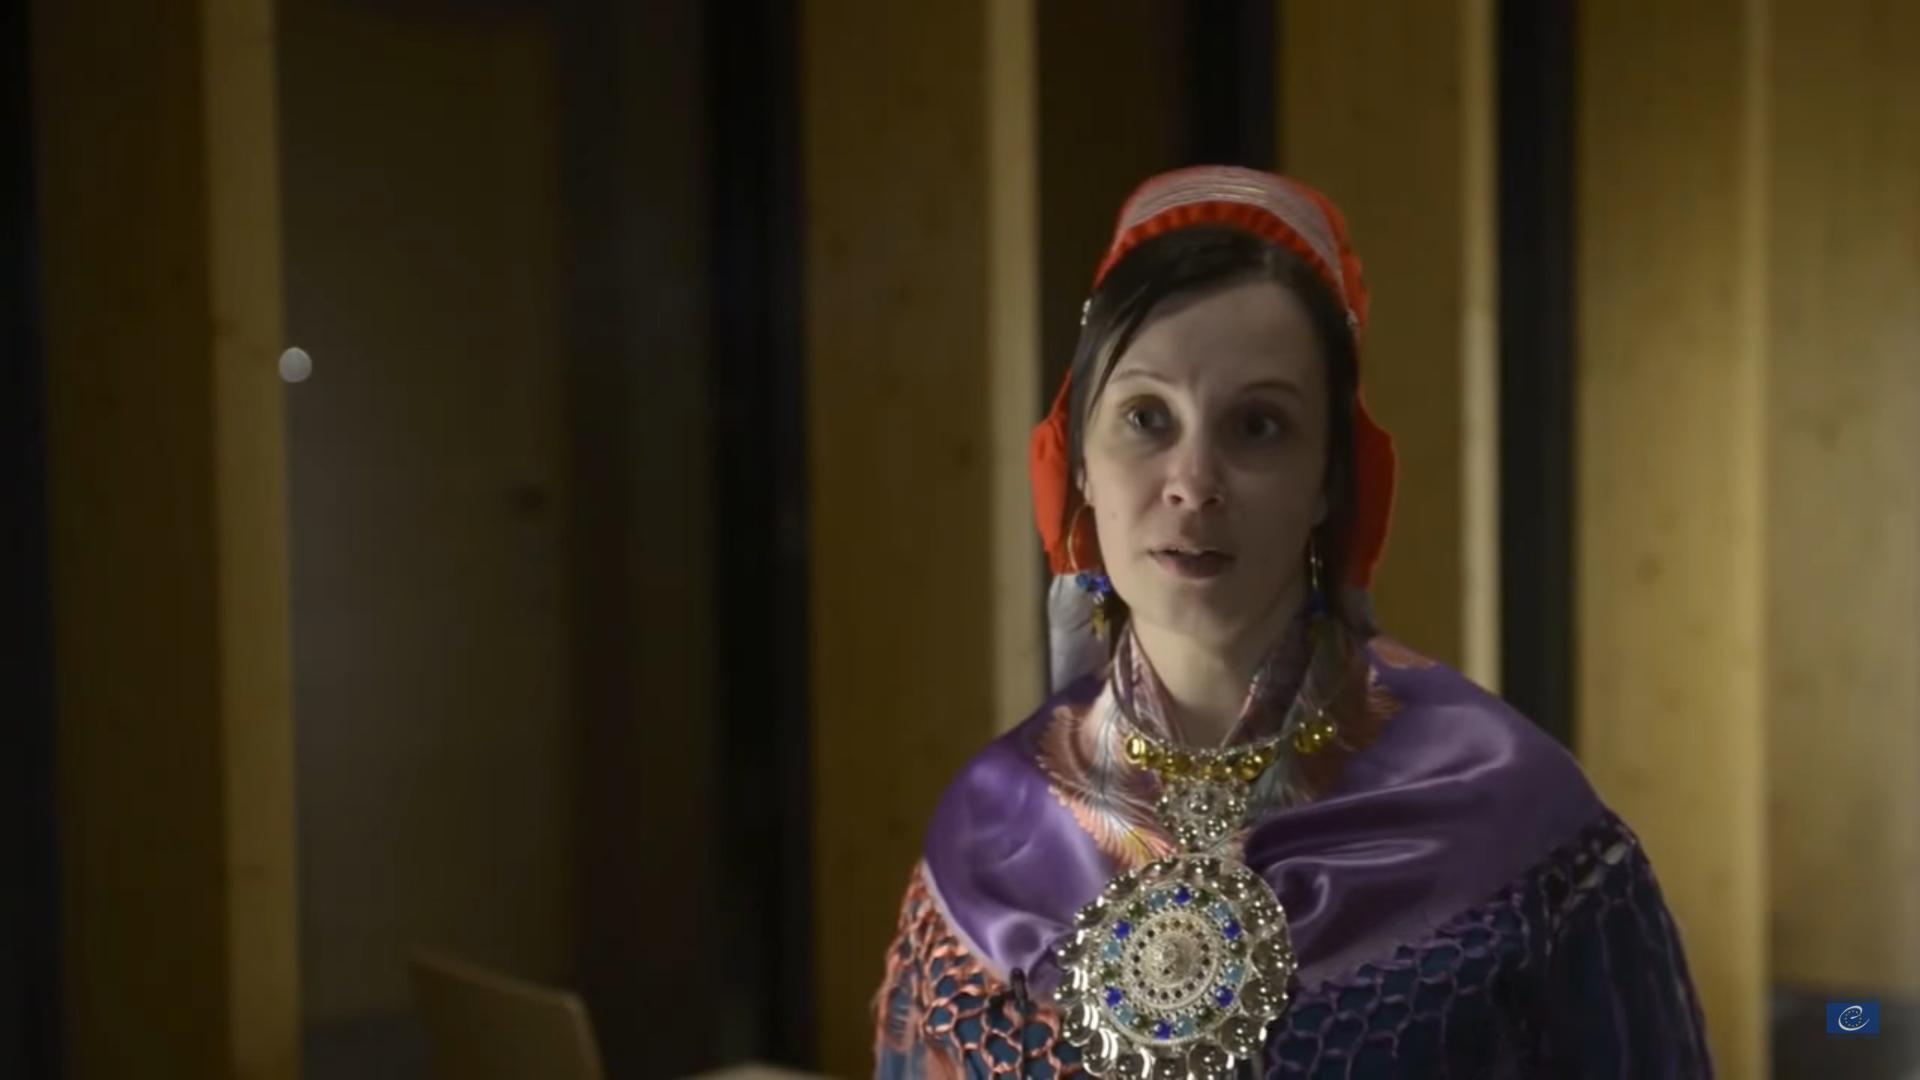 "Pirita Näkkäläjärvi 2014 @ Video ""Sámi - The People, Their Culture and Languages and the Council of Europe"". Photo Credit: Council of Europe"